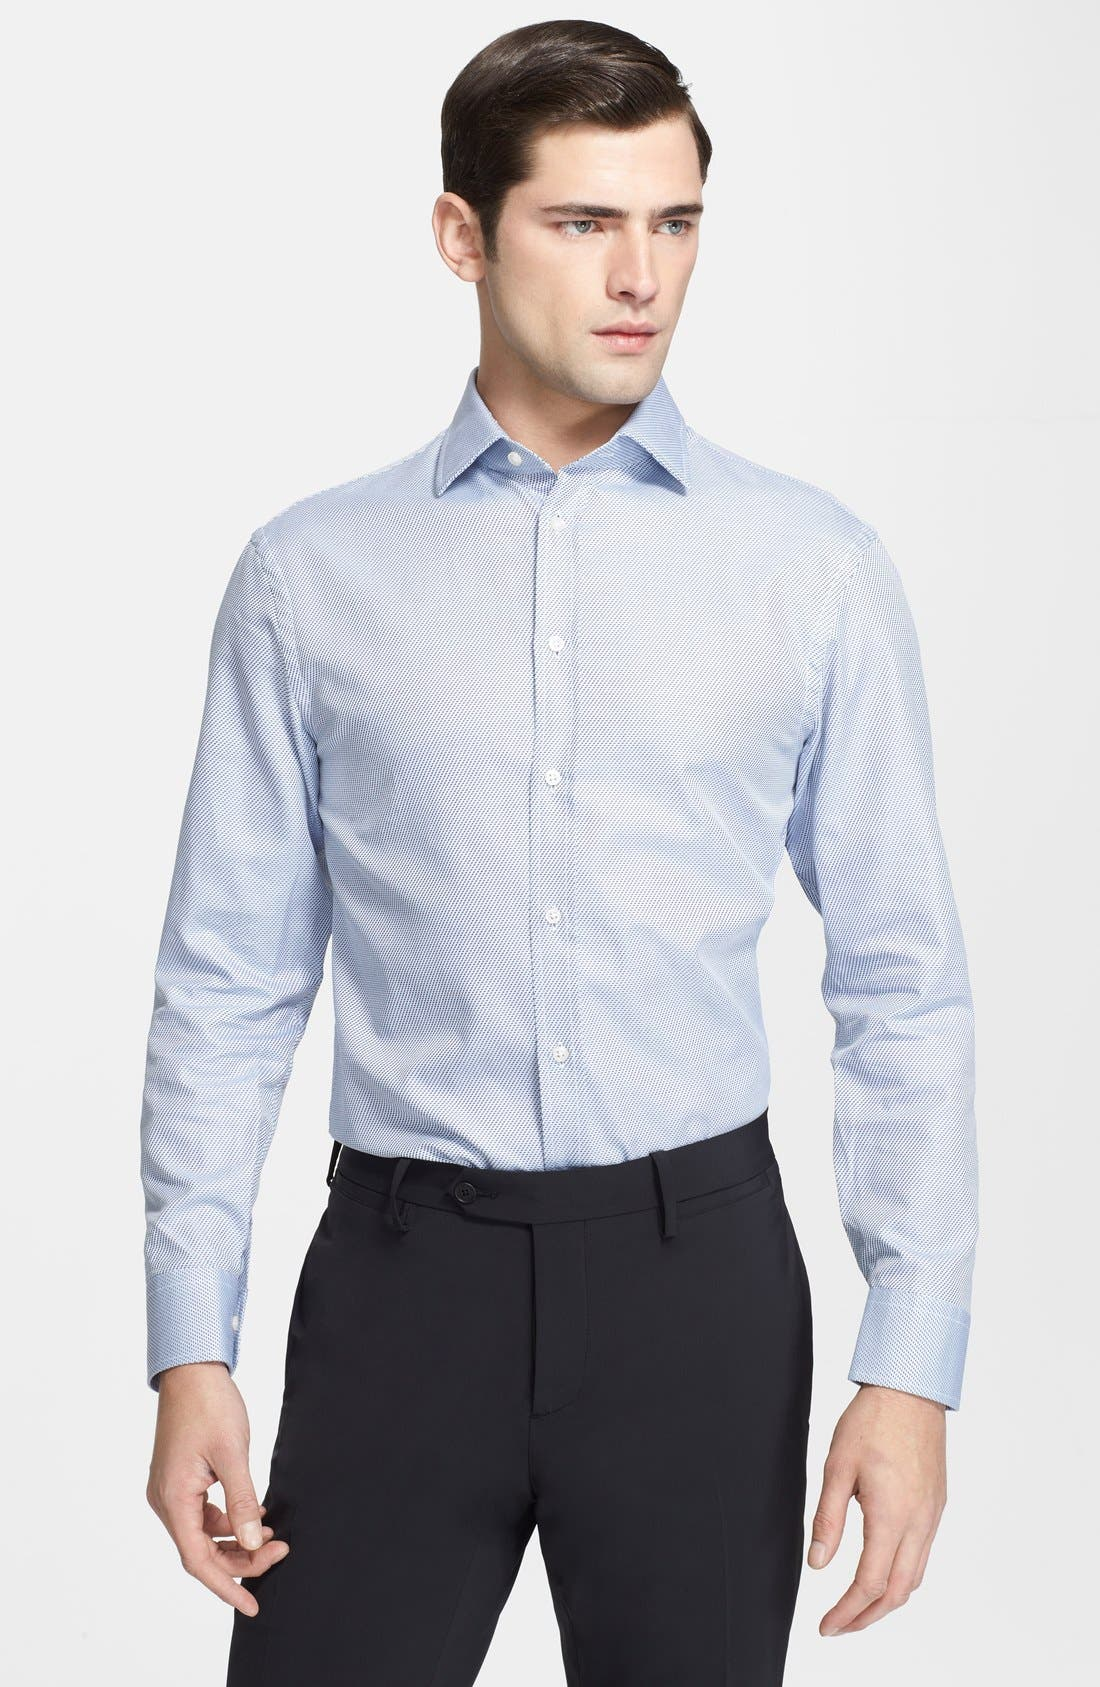 Main Image - Armani Collezioni Slim Fit Dress Shirt